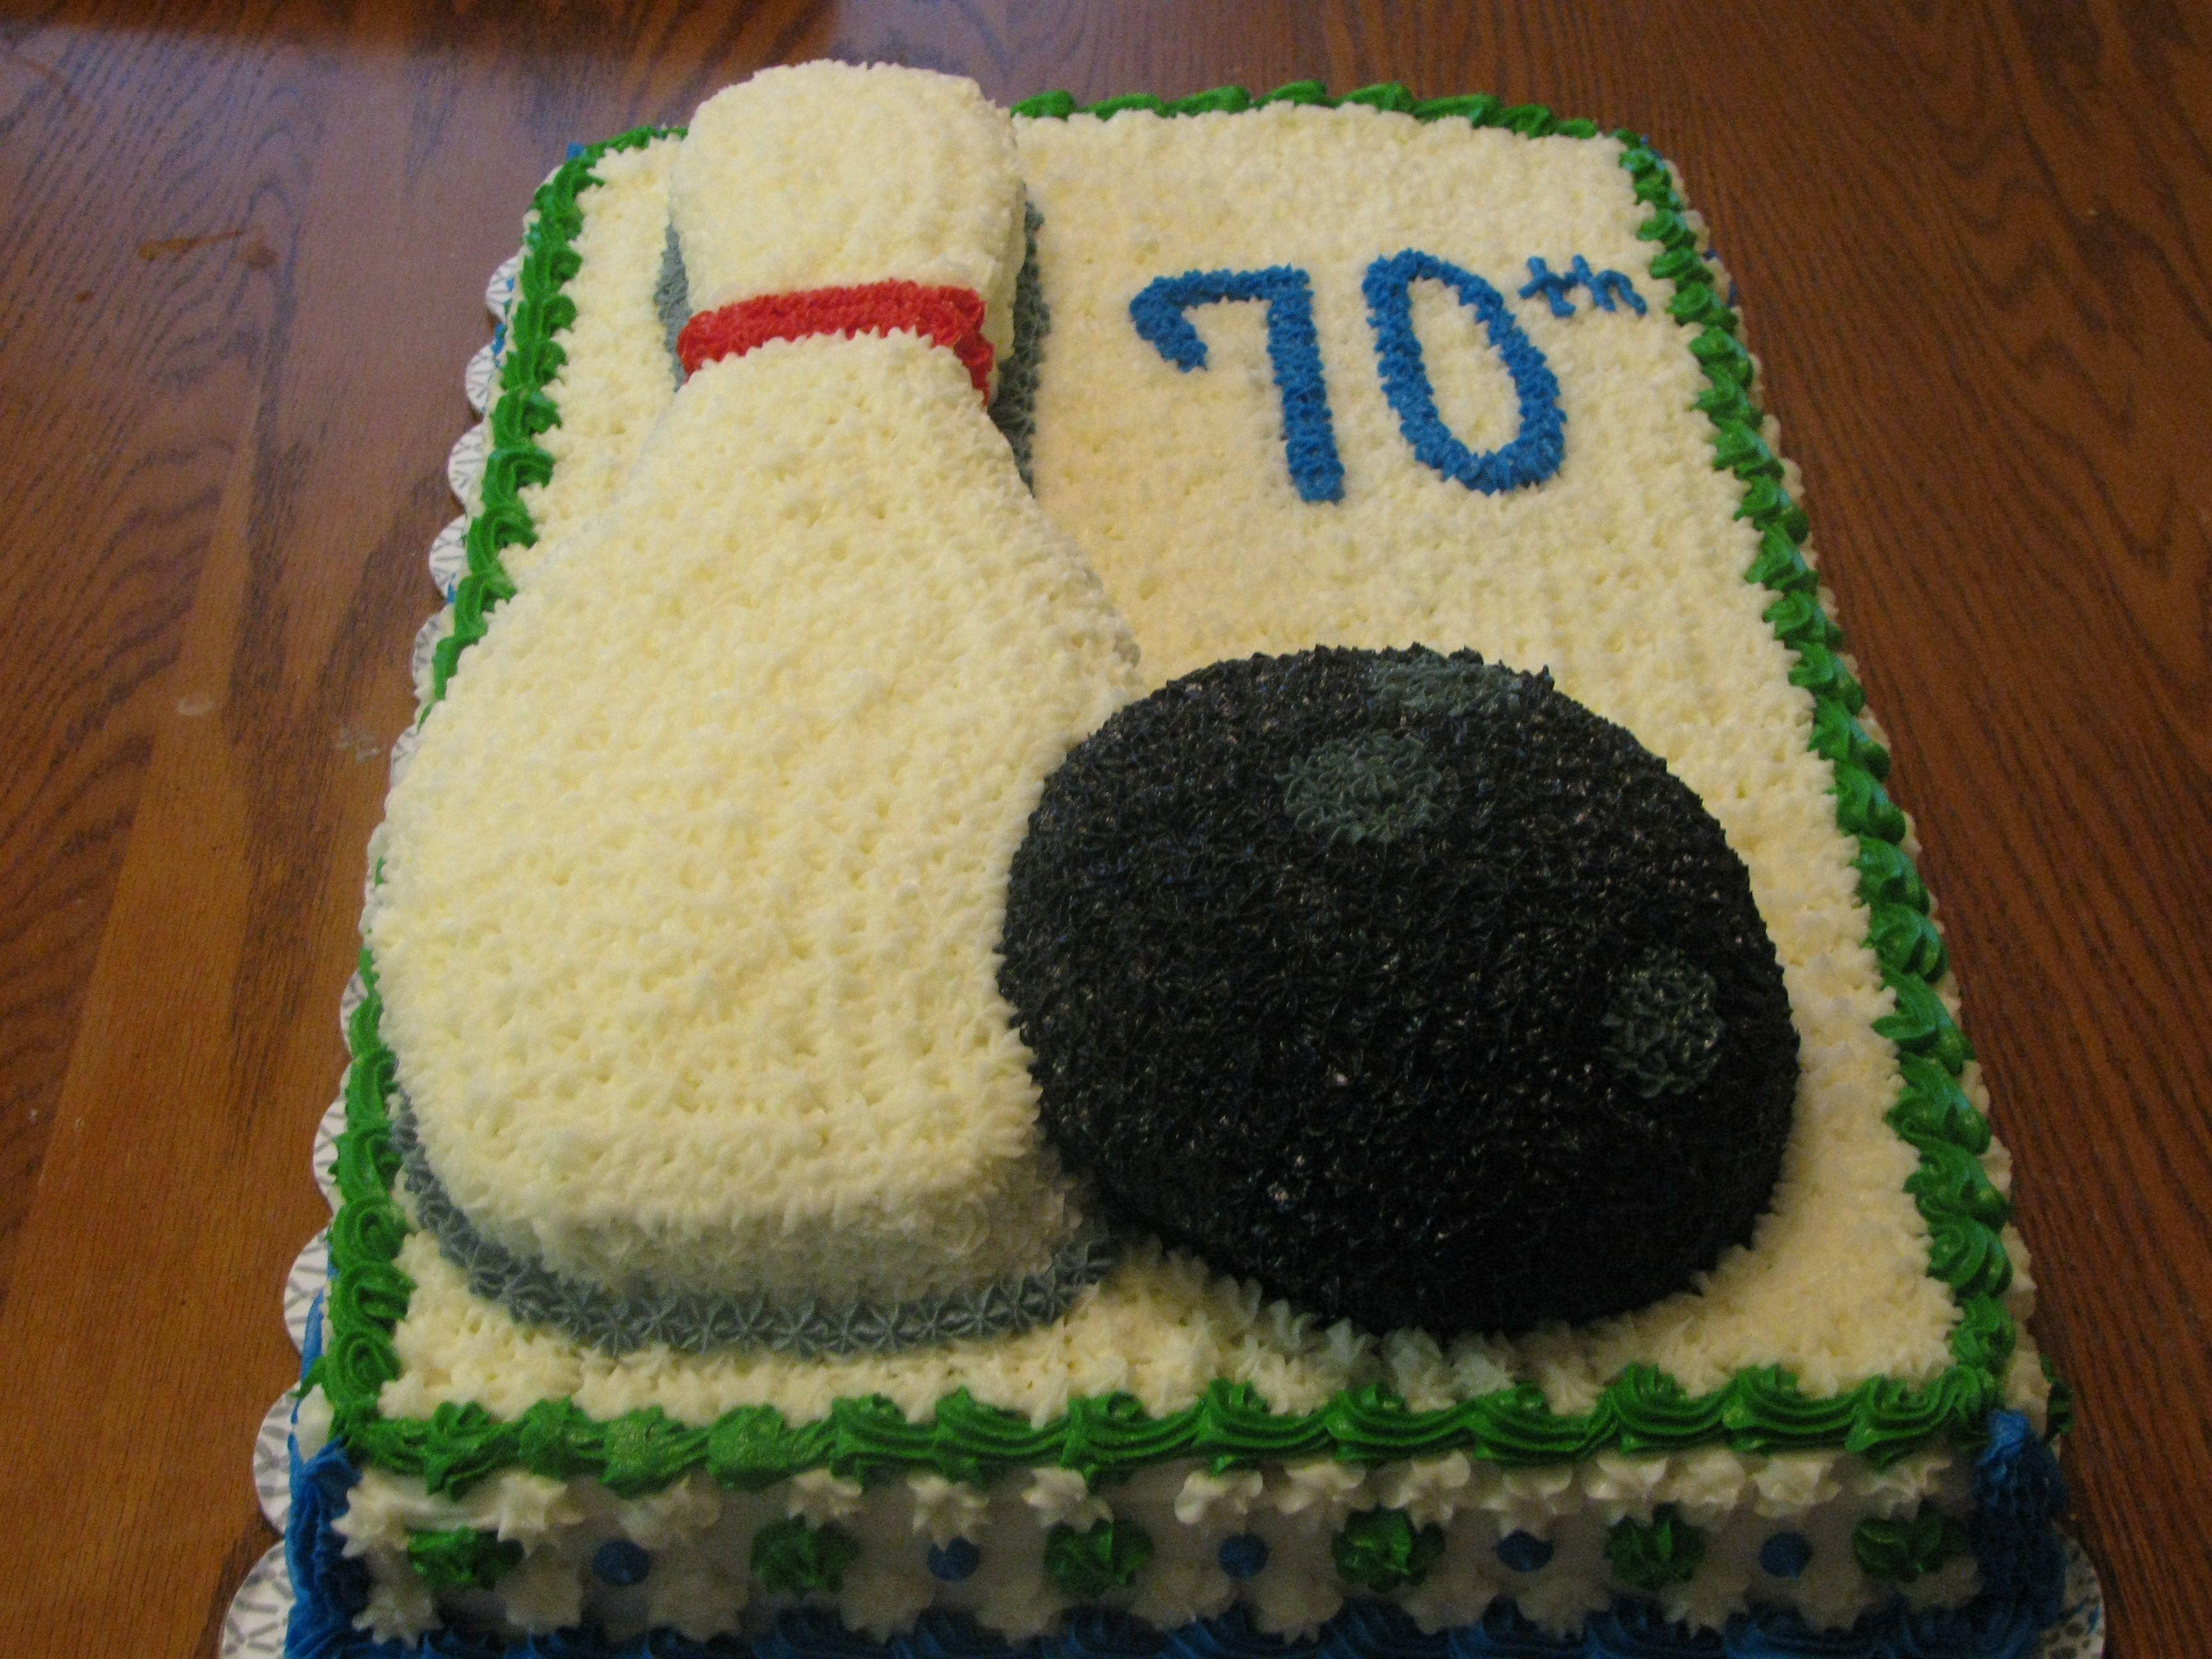 Bowling ball and pin cake.